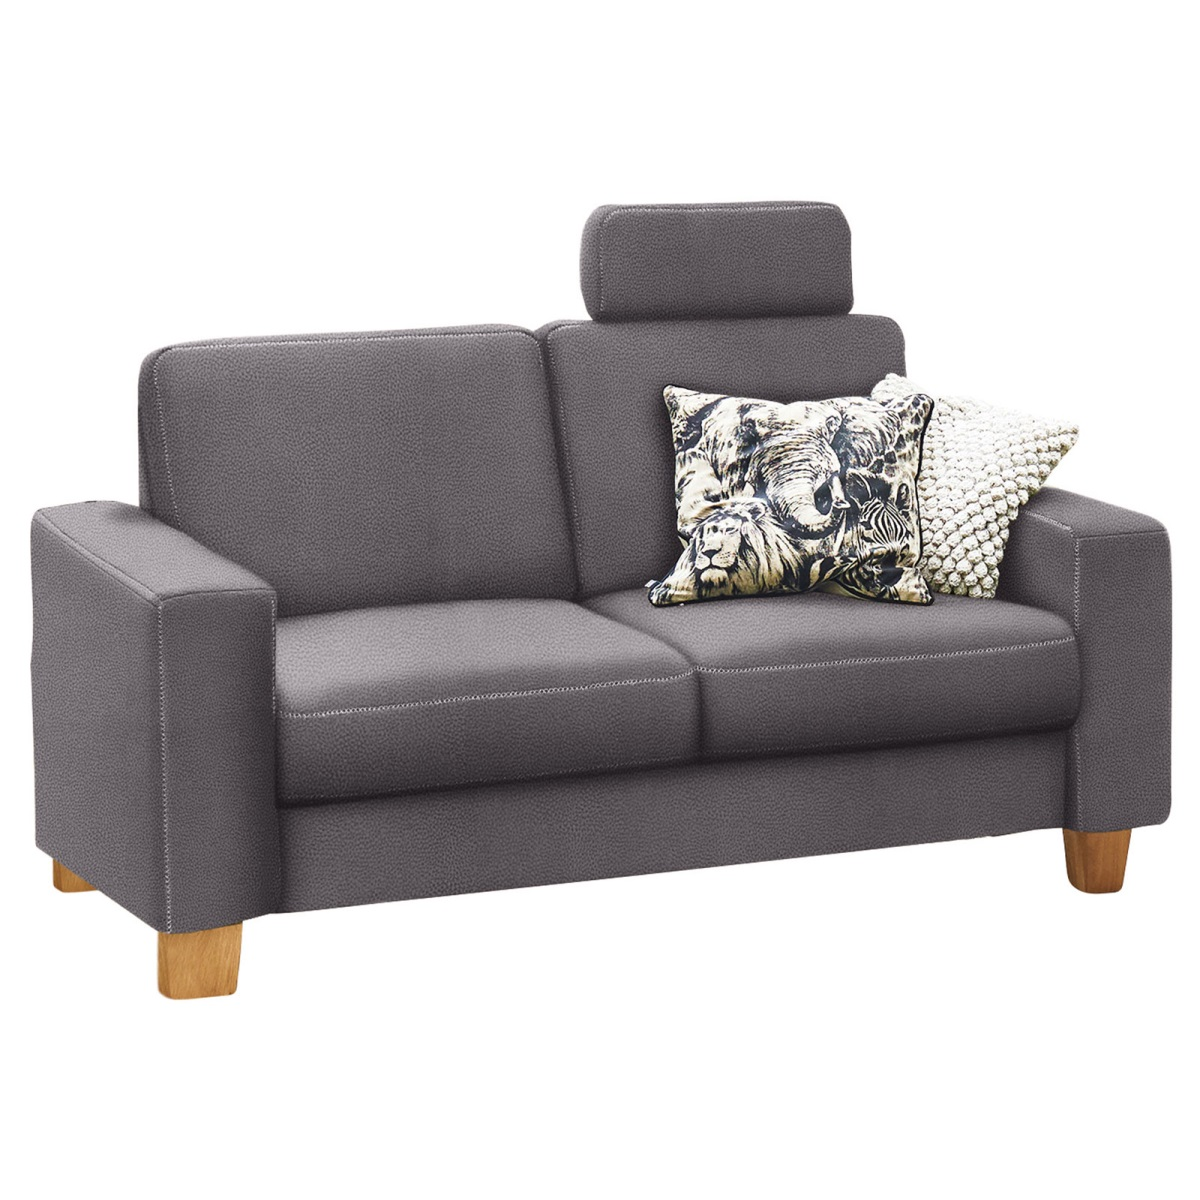 Full Size of Sofa 2 5 Sitzer Vito Relaxfunktion Betten 90x200 Baxter Langes Angebote Home Affaire Big Ebay Xxl Günstig Mit Recamiere Sofa Sofa 2 5 Sitzer